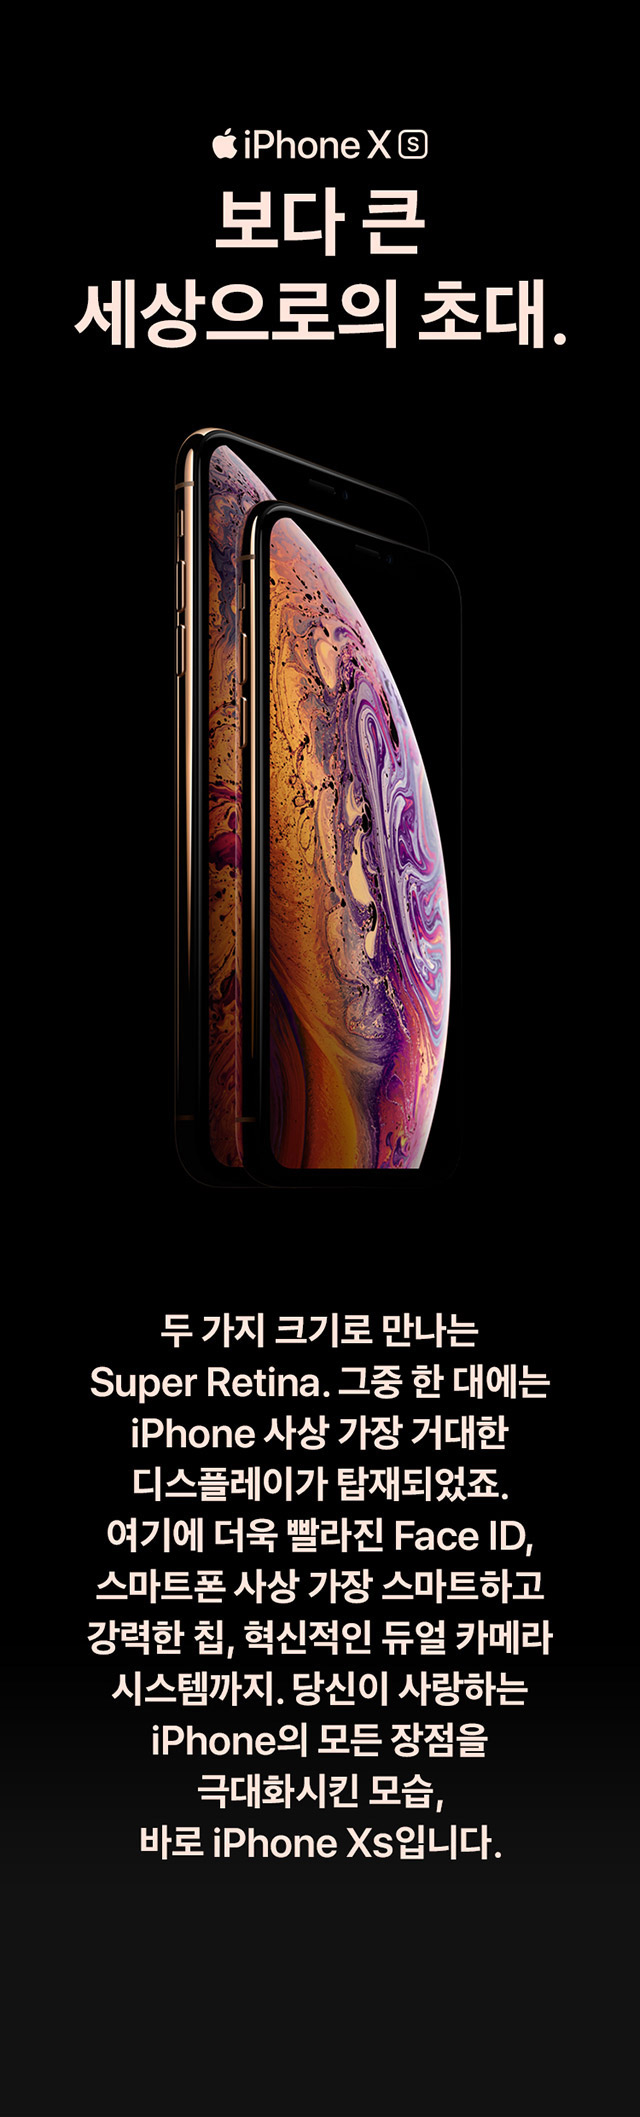 iPhone Xs 보다 큰 세상으로의 초대. 두 가지 크기로 만나는 Super Retina. 그중 한 대에는 iPhone 사상 가장 거대한 디스플레이가 탑재되었죠. 여기에 더욱 빨라진 Face ID, 스마트폰 사상 가장 스마트하고 강력한 칩, 혁신적인 듀얼 카메라 시스템까지. 당신이 사랑하는 iPhone의 모든 장점을 극대화시킨 모습, 바로 iPhone Xs입니다.